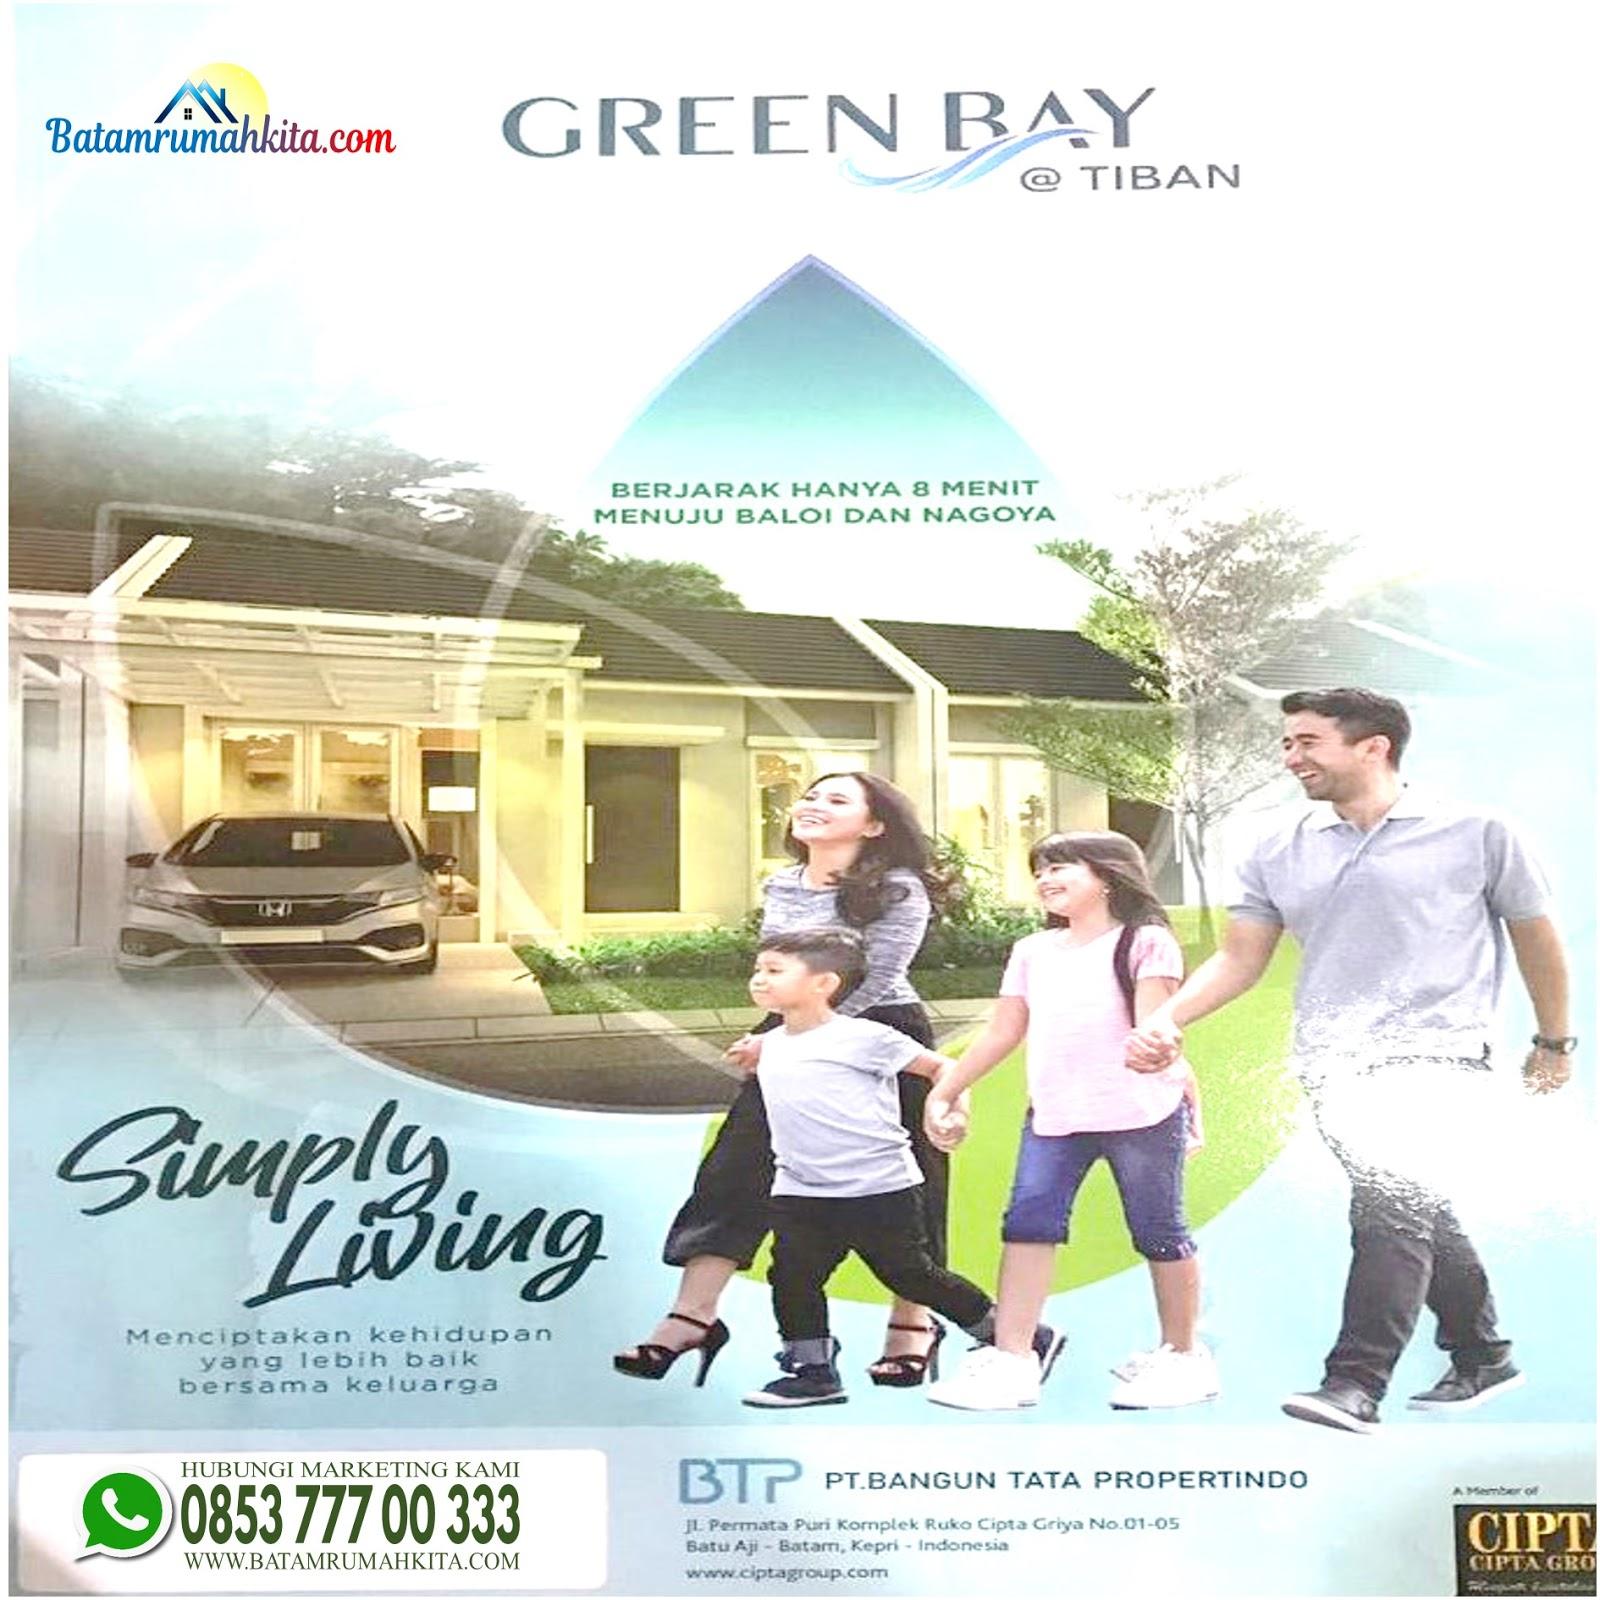 perumahan green bay tiban batam